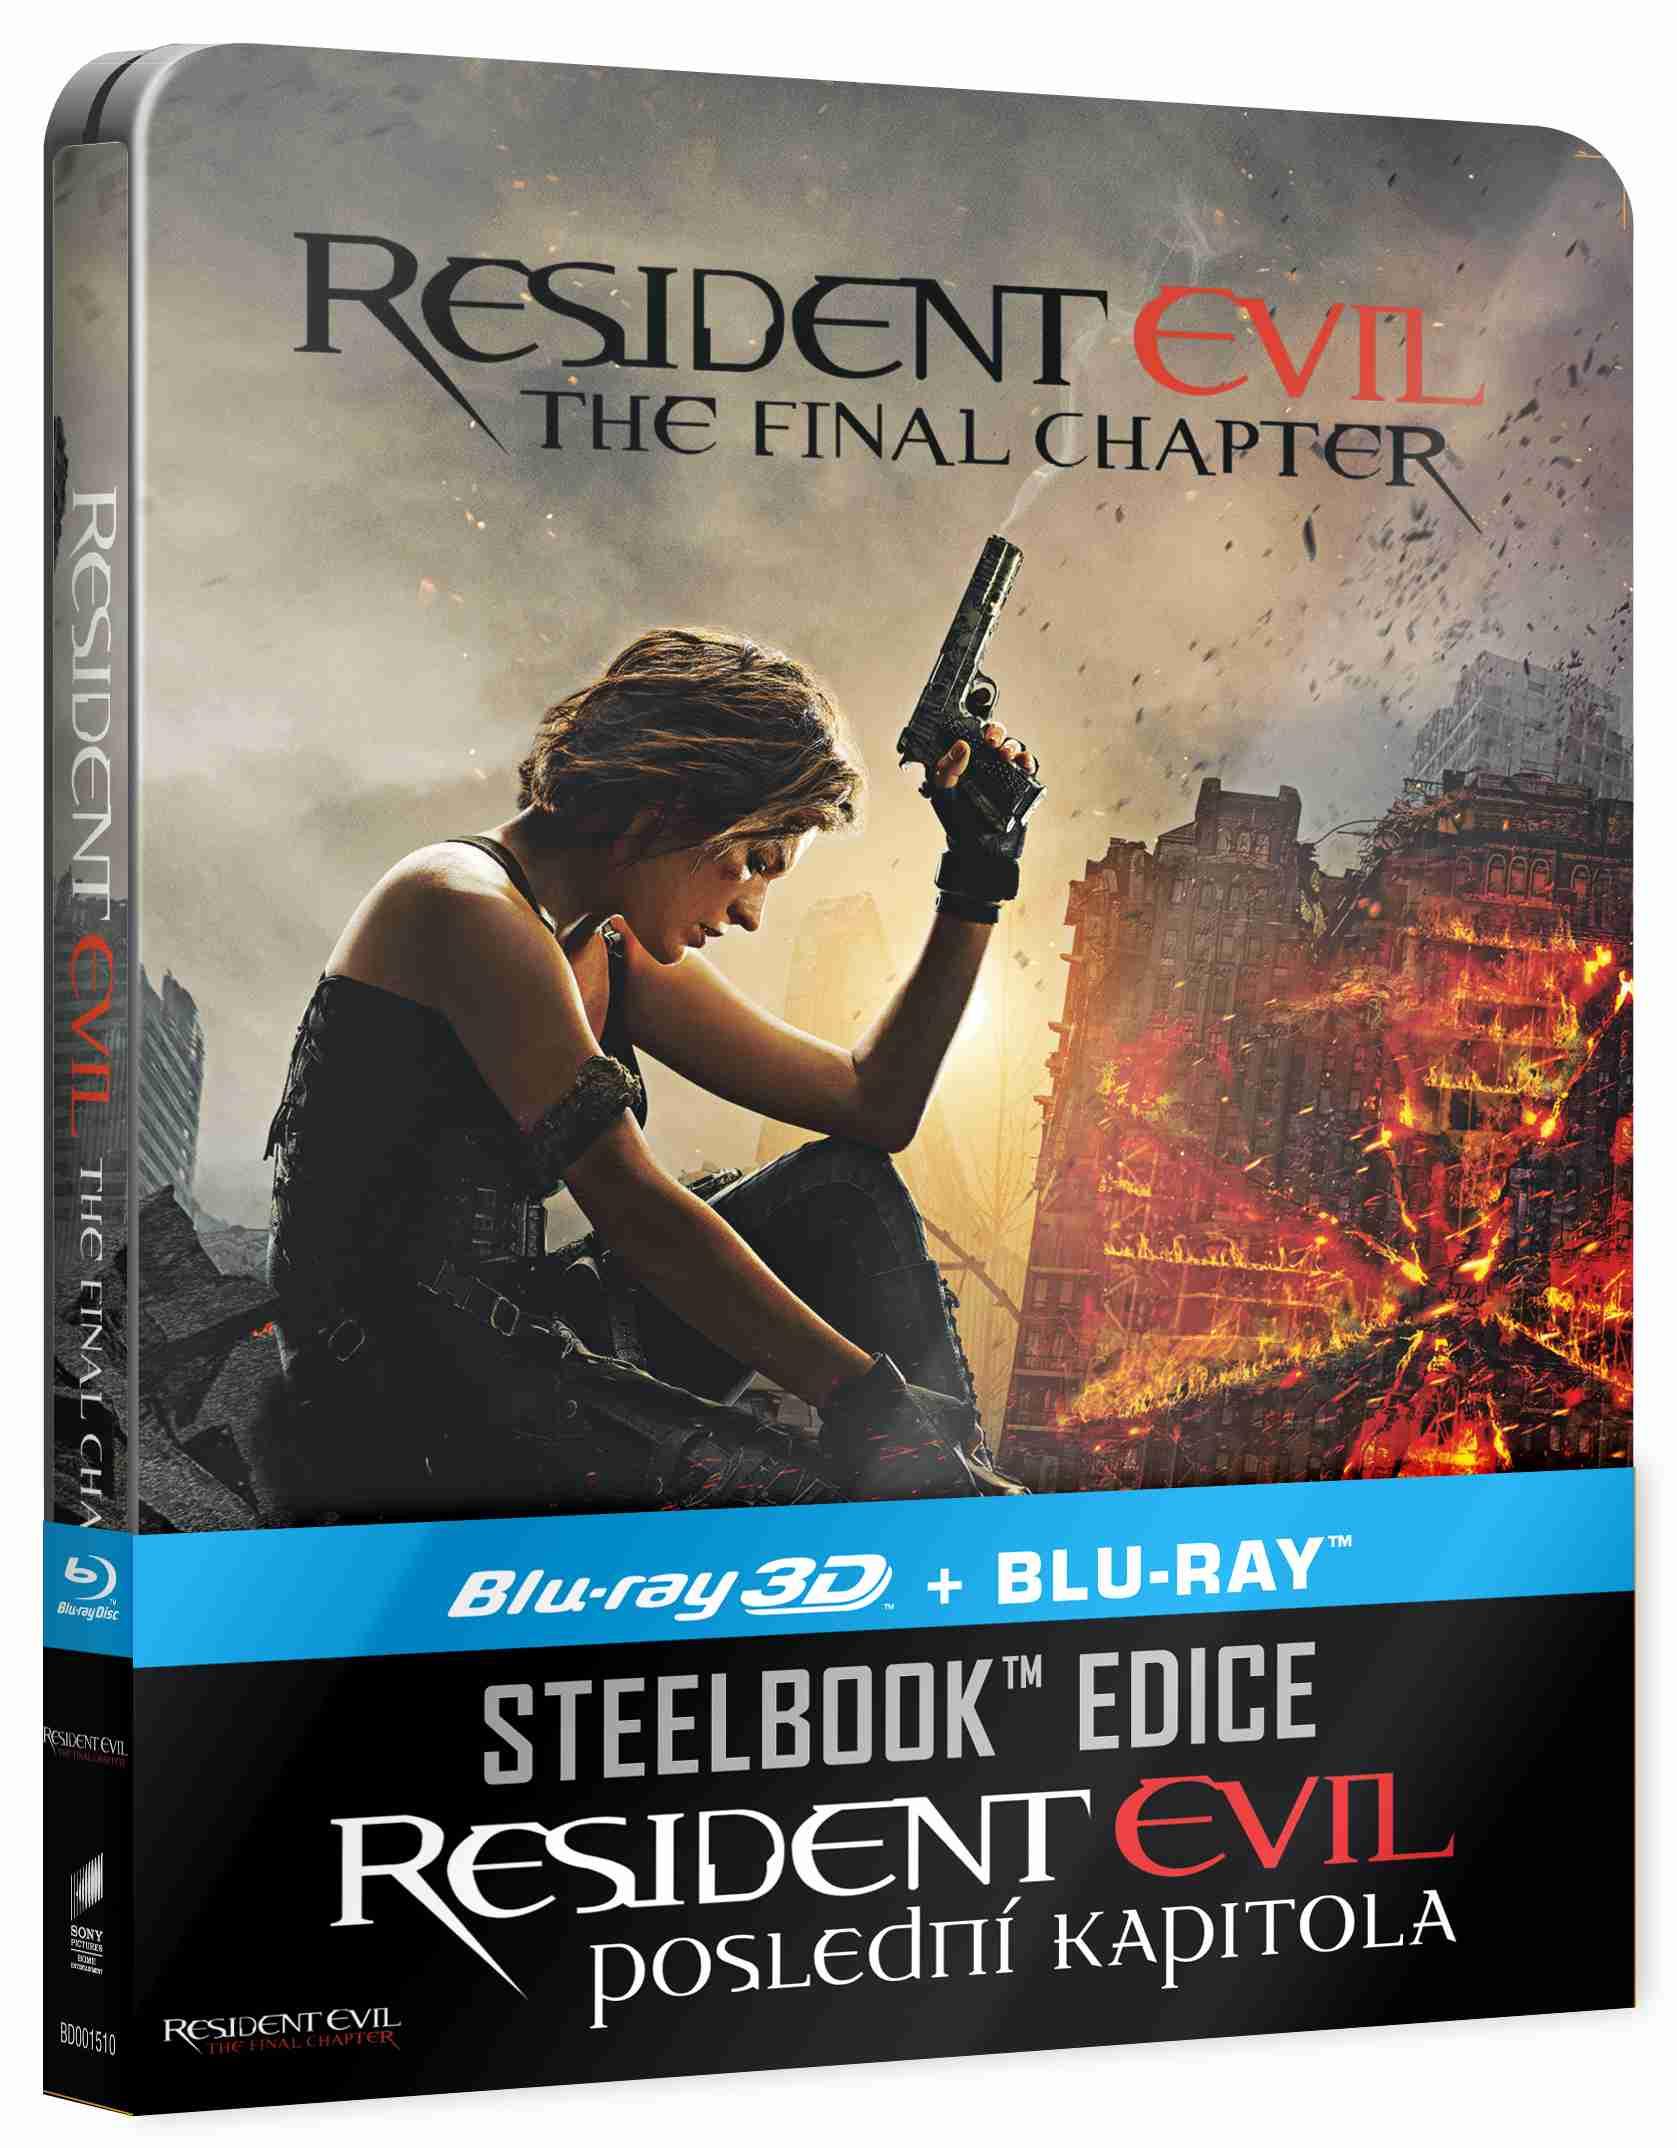 RESIDENT EVIL: POSLEDNÍ KAPITOLA - Blu-ray 3D + 2D STEELBOOK (2 BD)